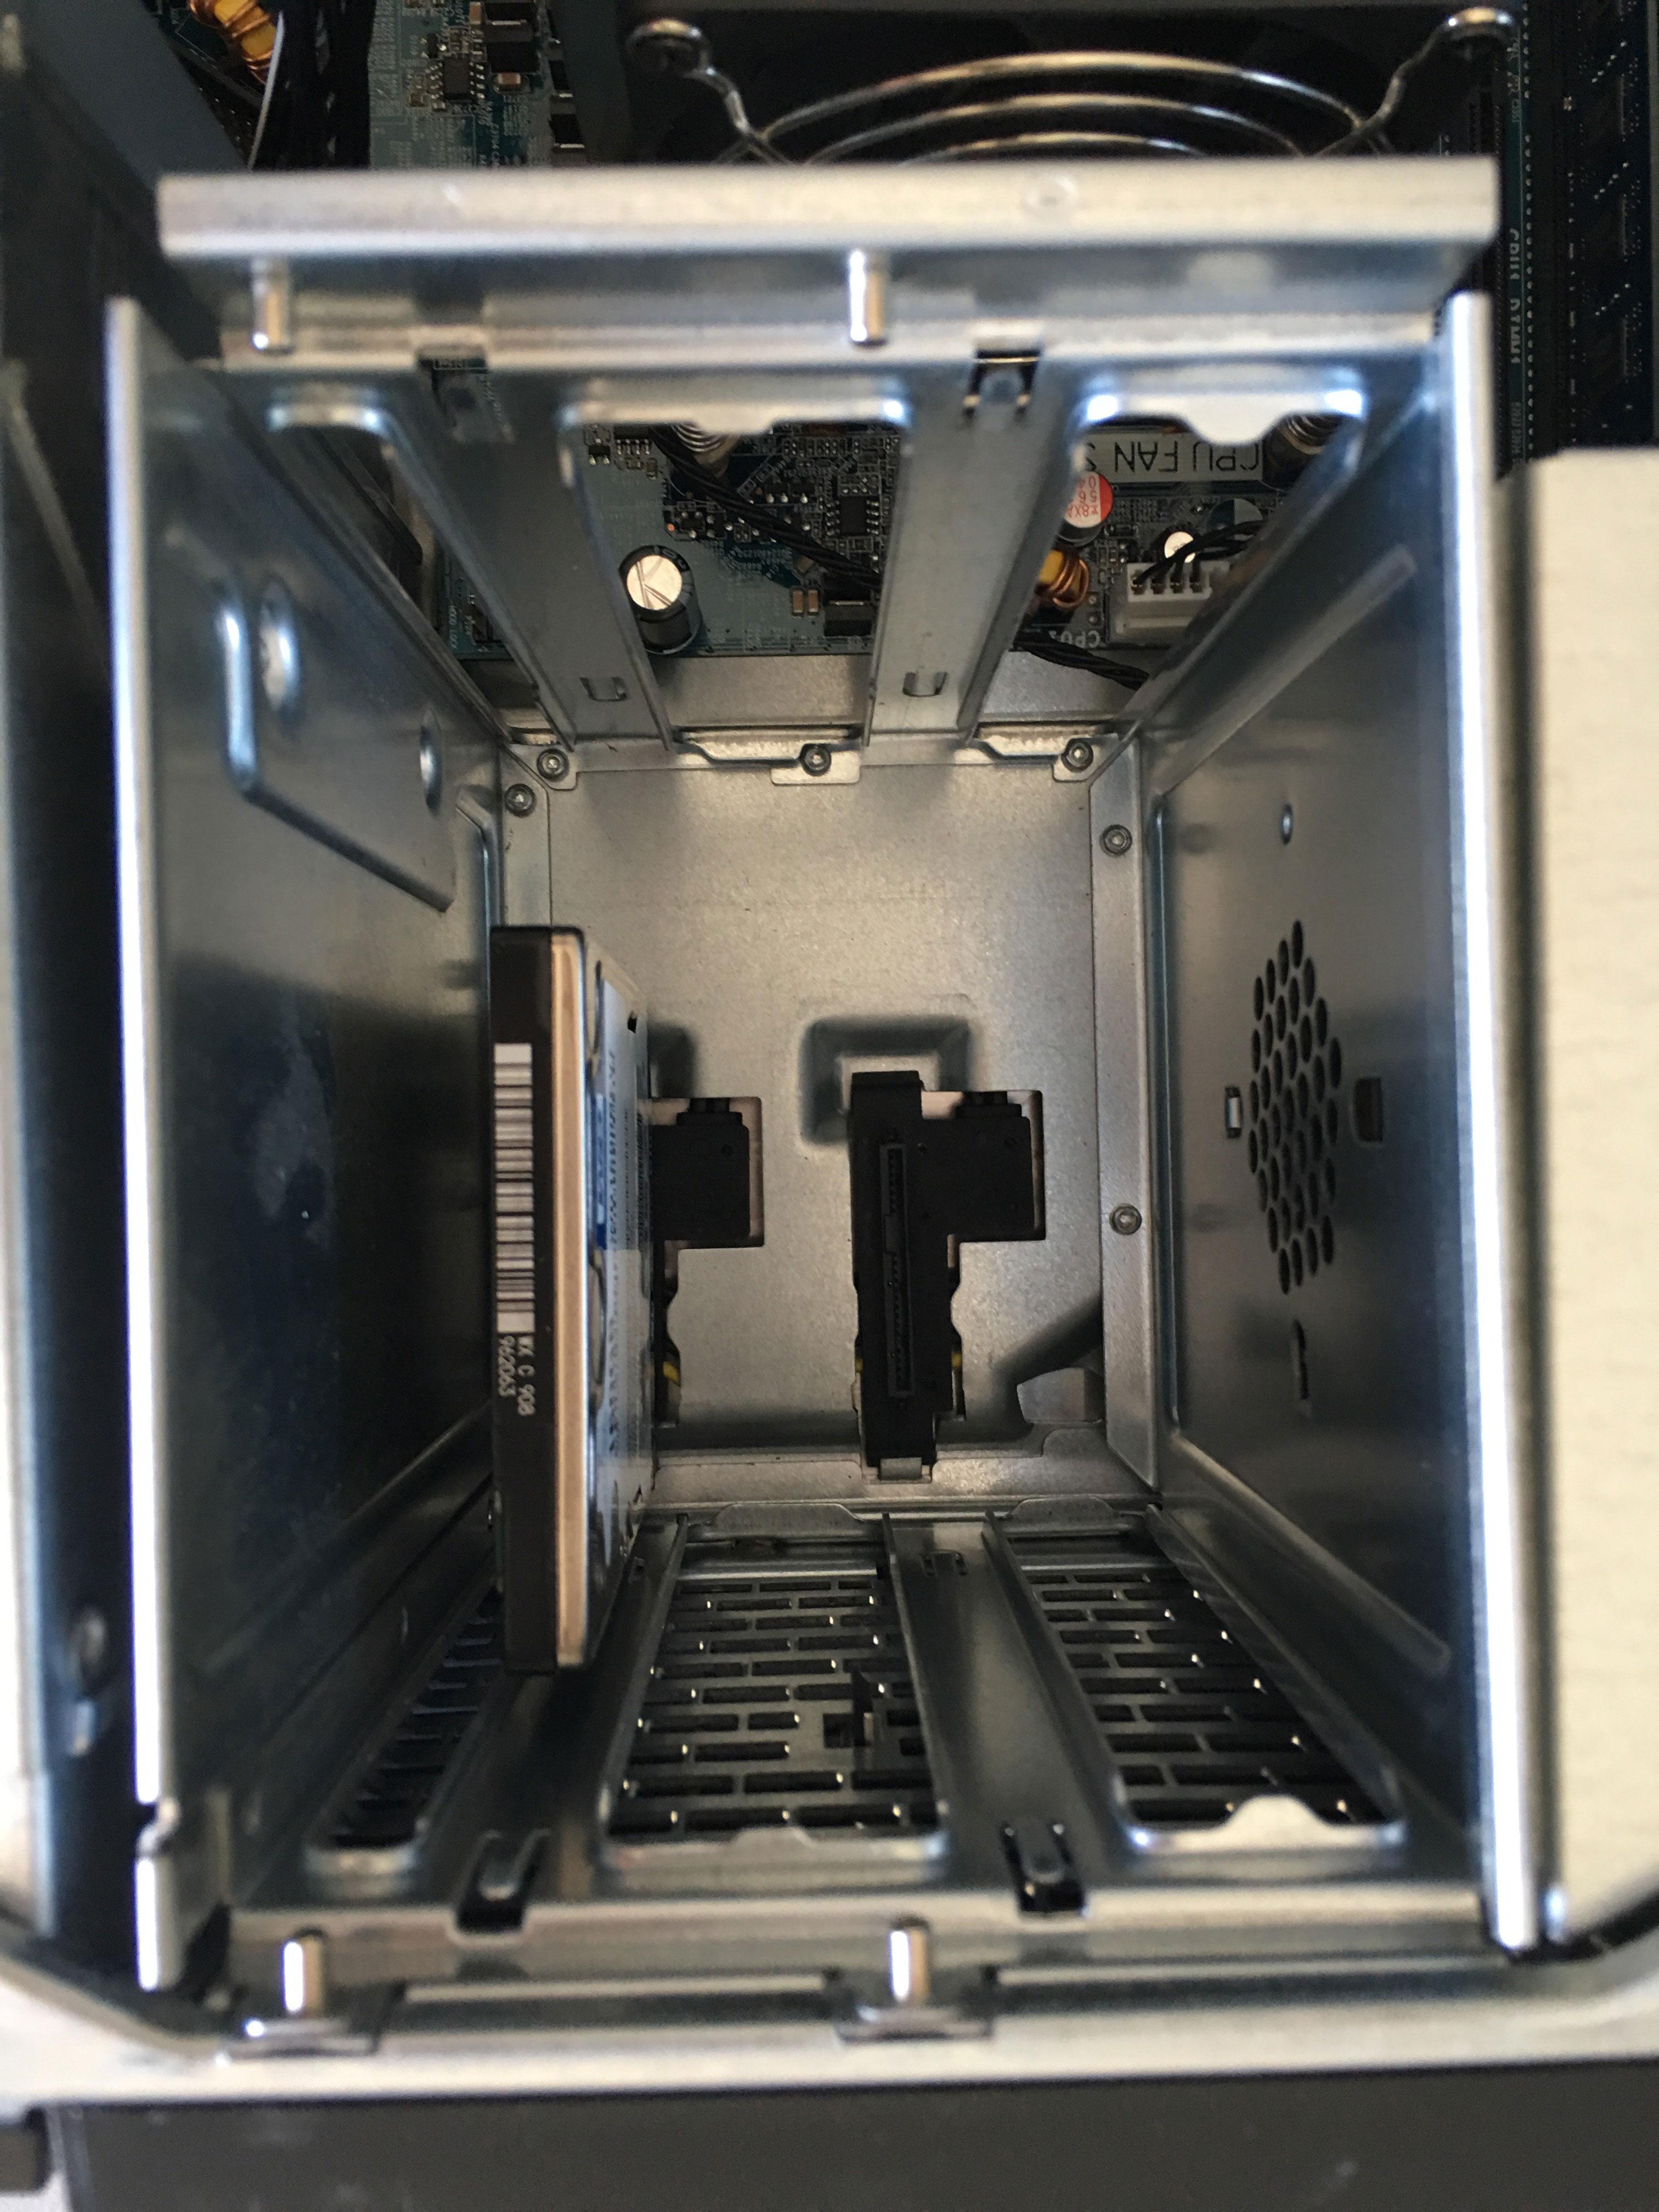 My new HP Z600 Workstation | JAY VERSLUIS